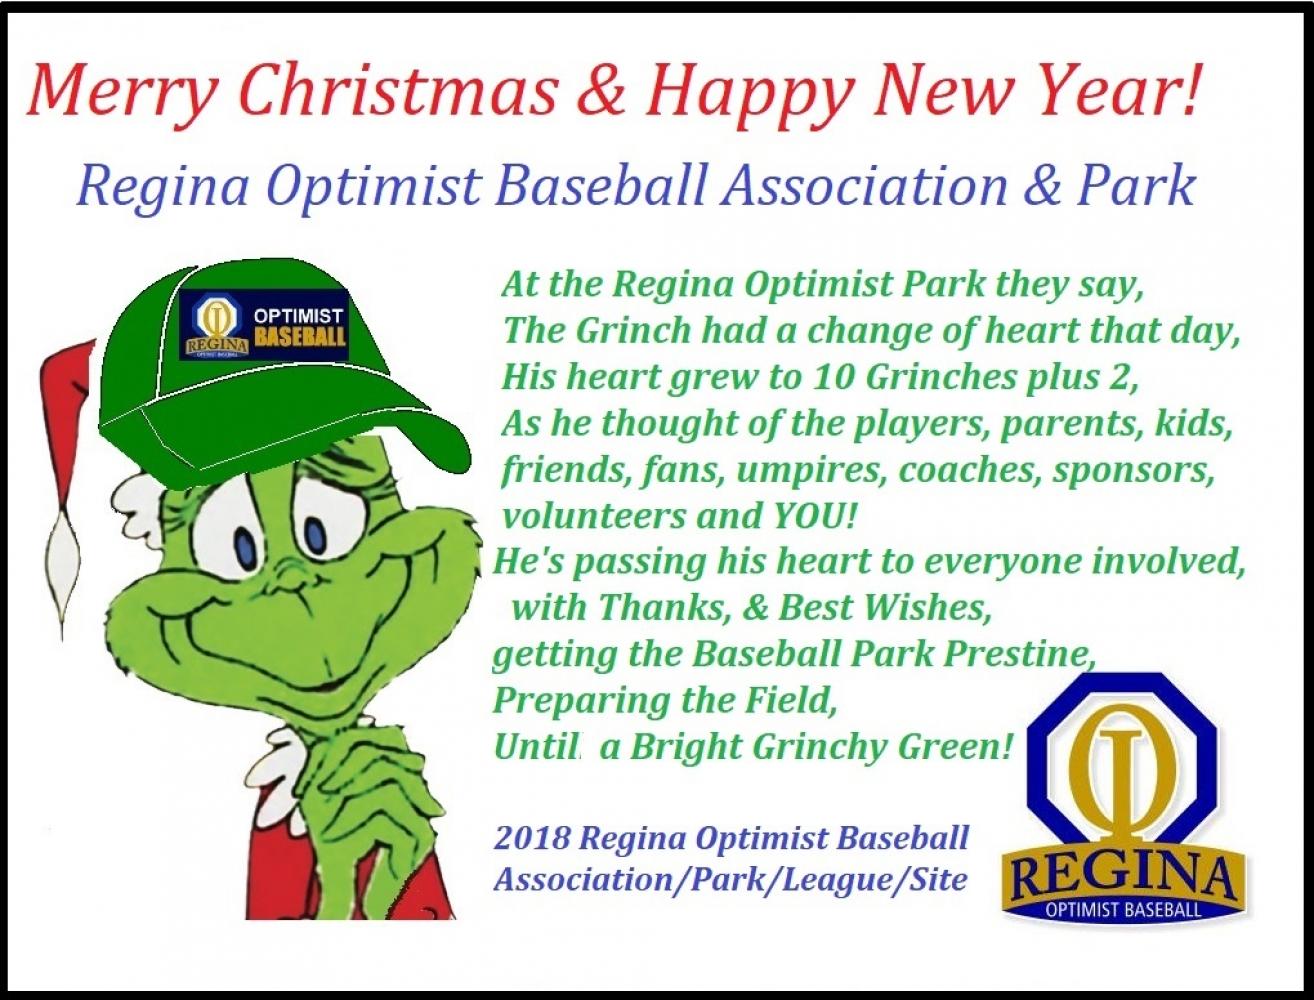 Merry Christmas & Happy New Year from The Regina Optimist Baseball Association!!!